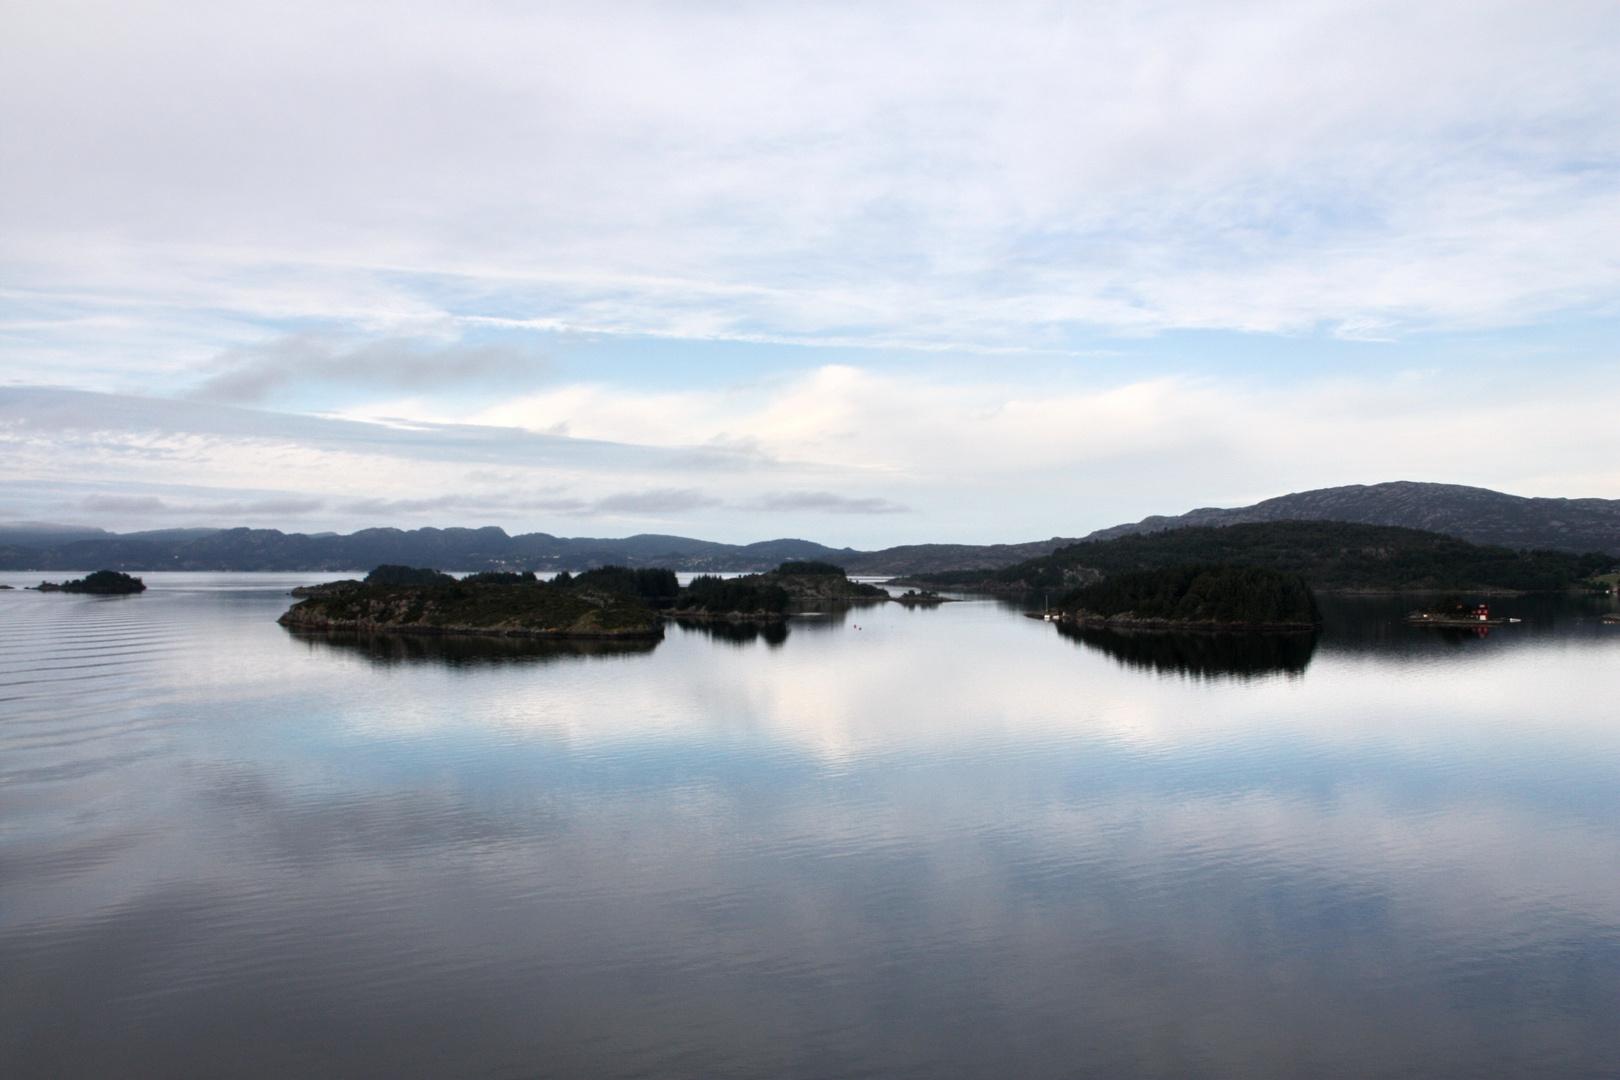 Bergenfjord